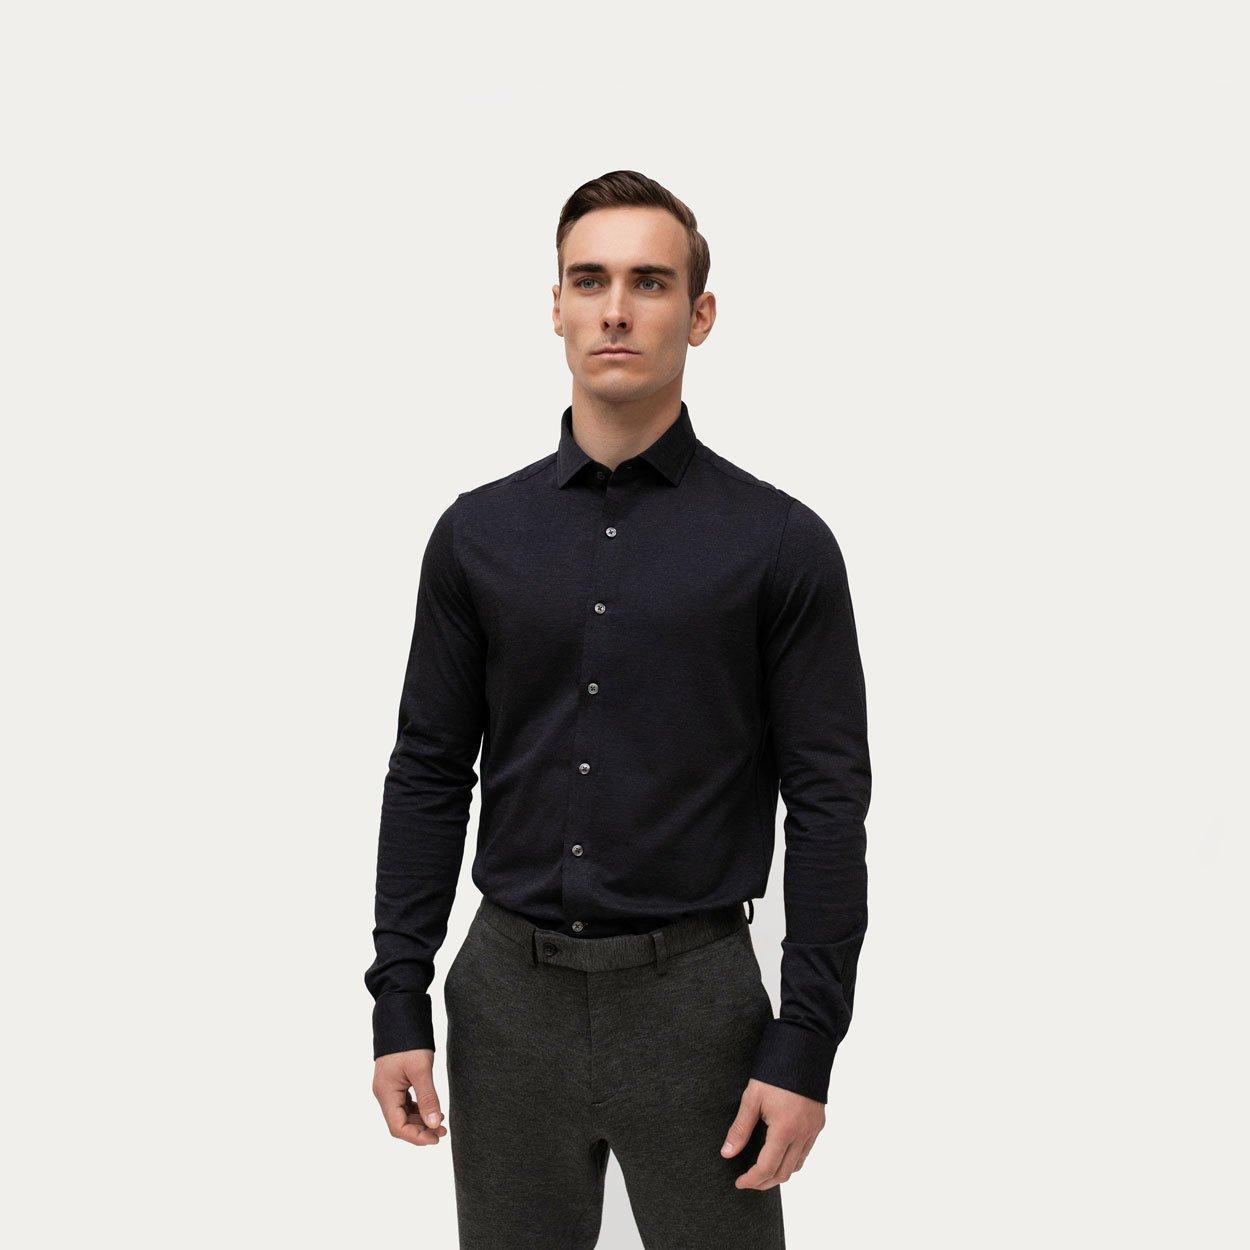 nicestuff clothing long sleeve shirt